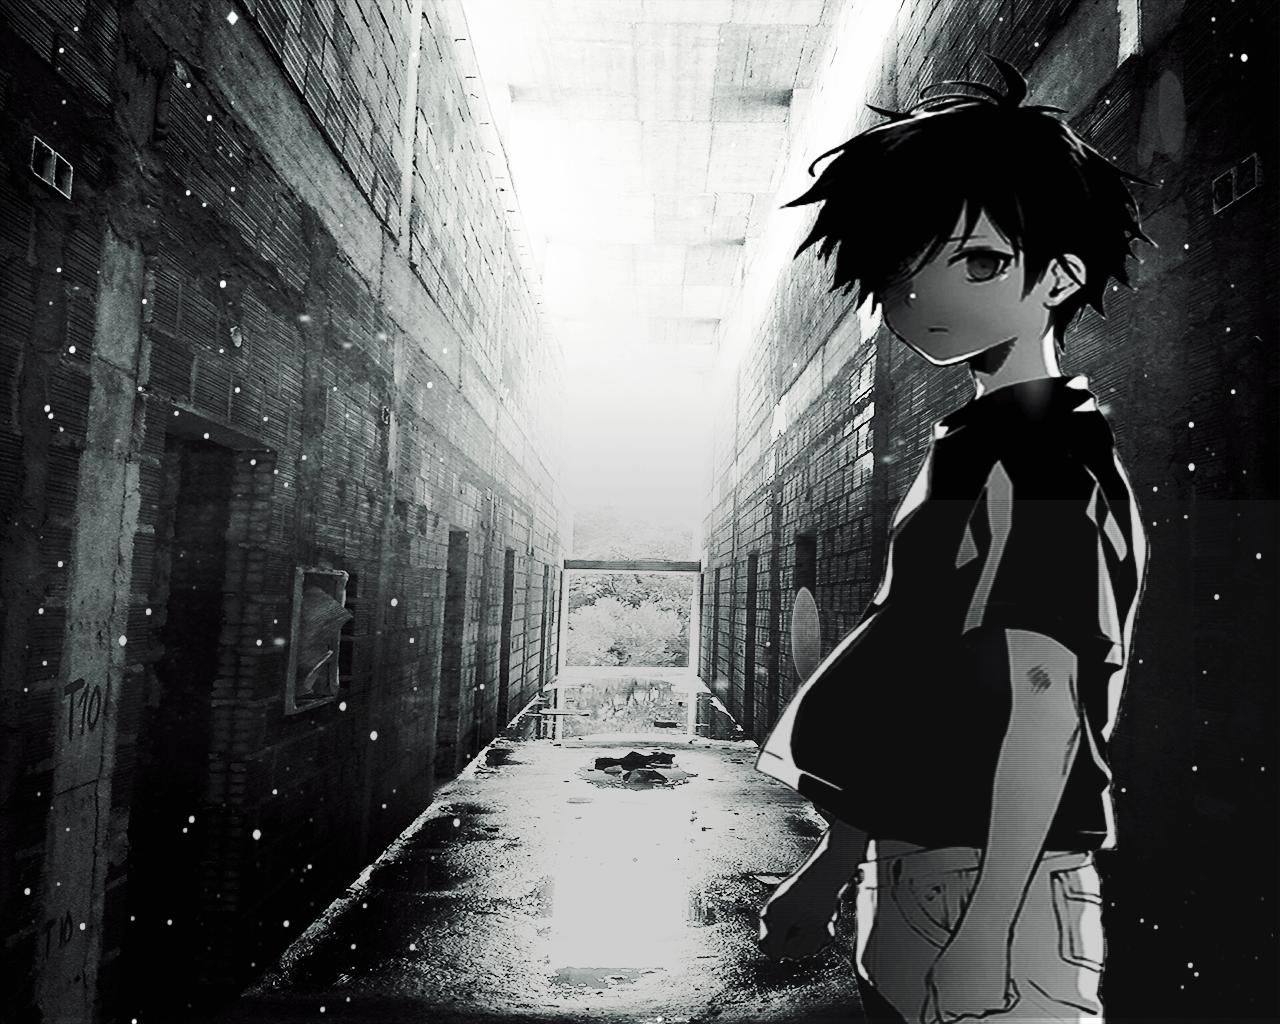 Back To 66 Sad Anime Boy Wallpapers Hd   Monochrome 1029333 1280x1024